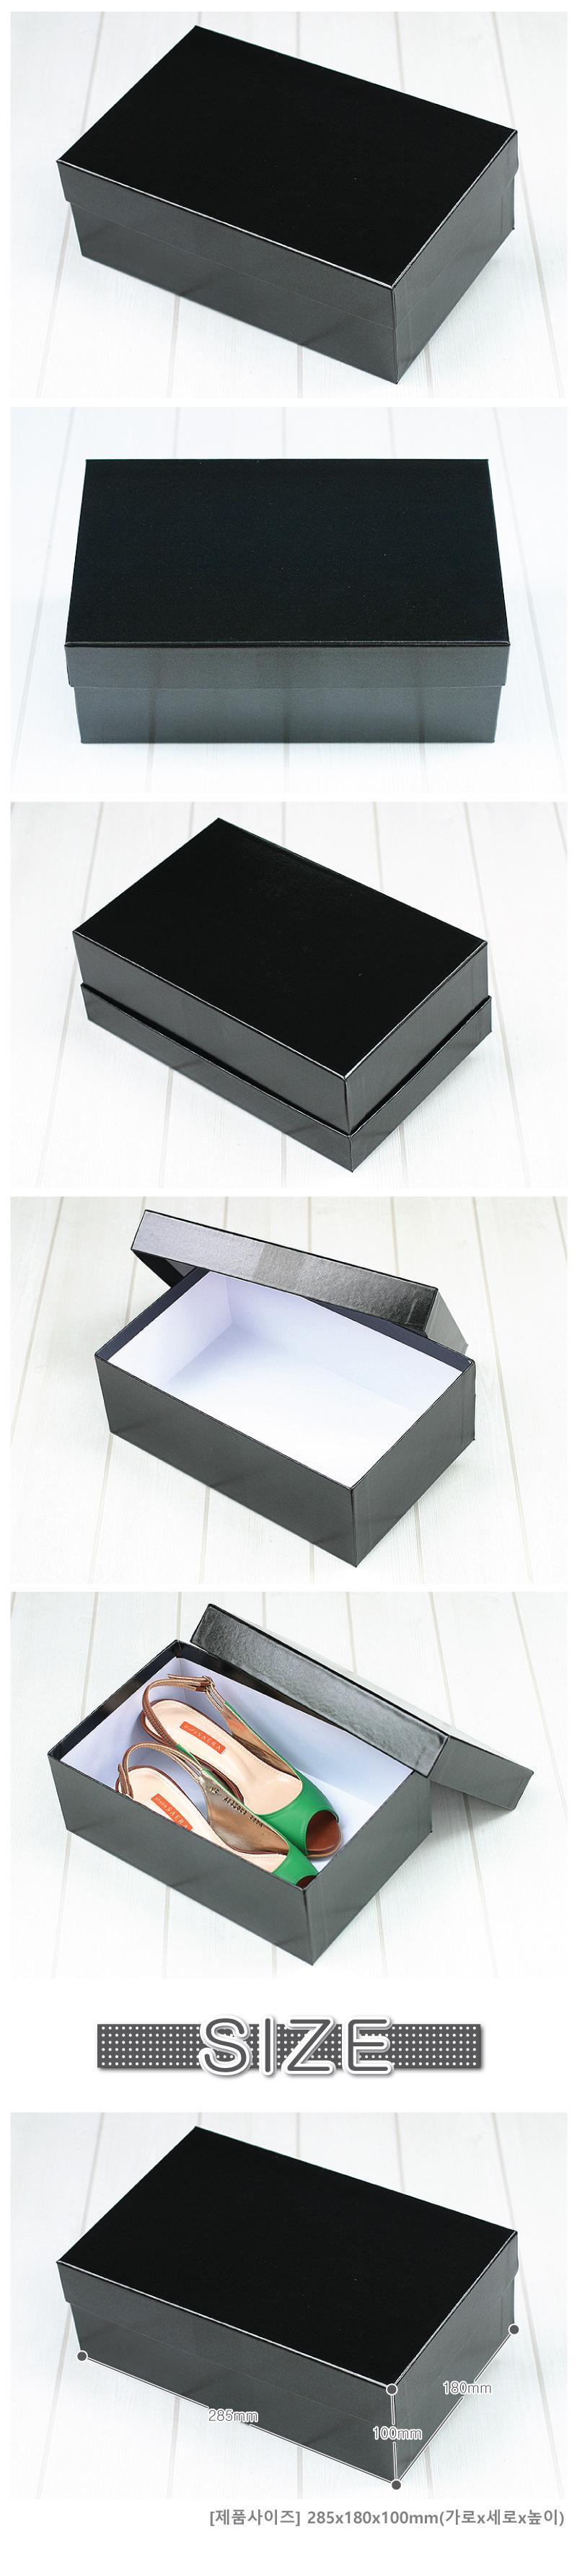 black285ssabari.jpg